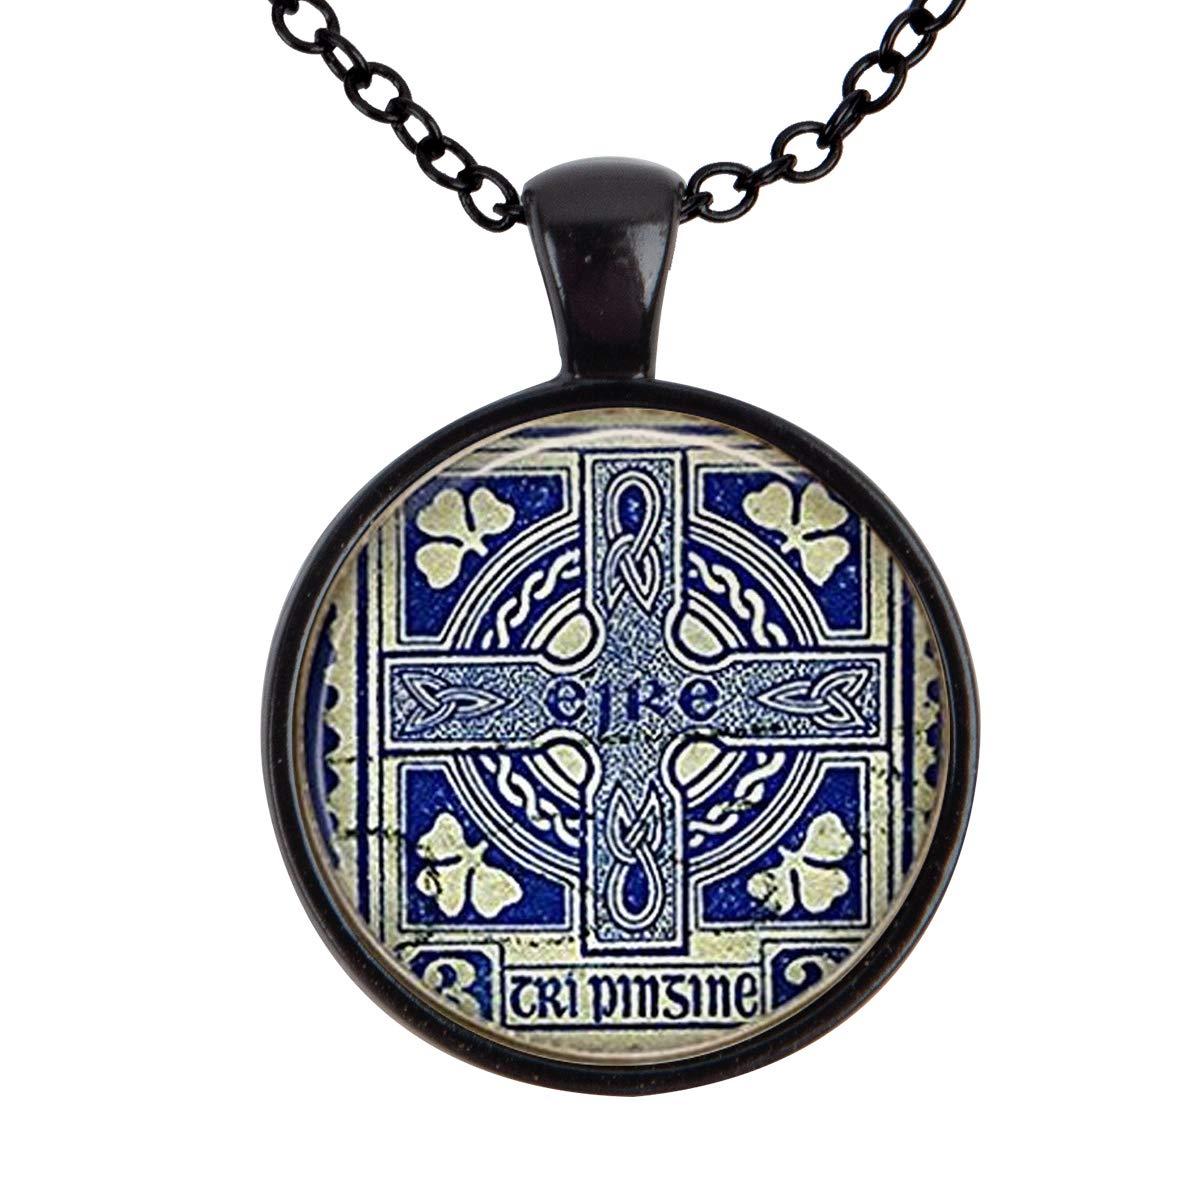 Family Decor Vintage Ireland Stamp Ireland Memento Pendant Necklace Cabochon Glass Vintage Bronze Chain Necklace Jewelry Handmade